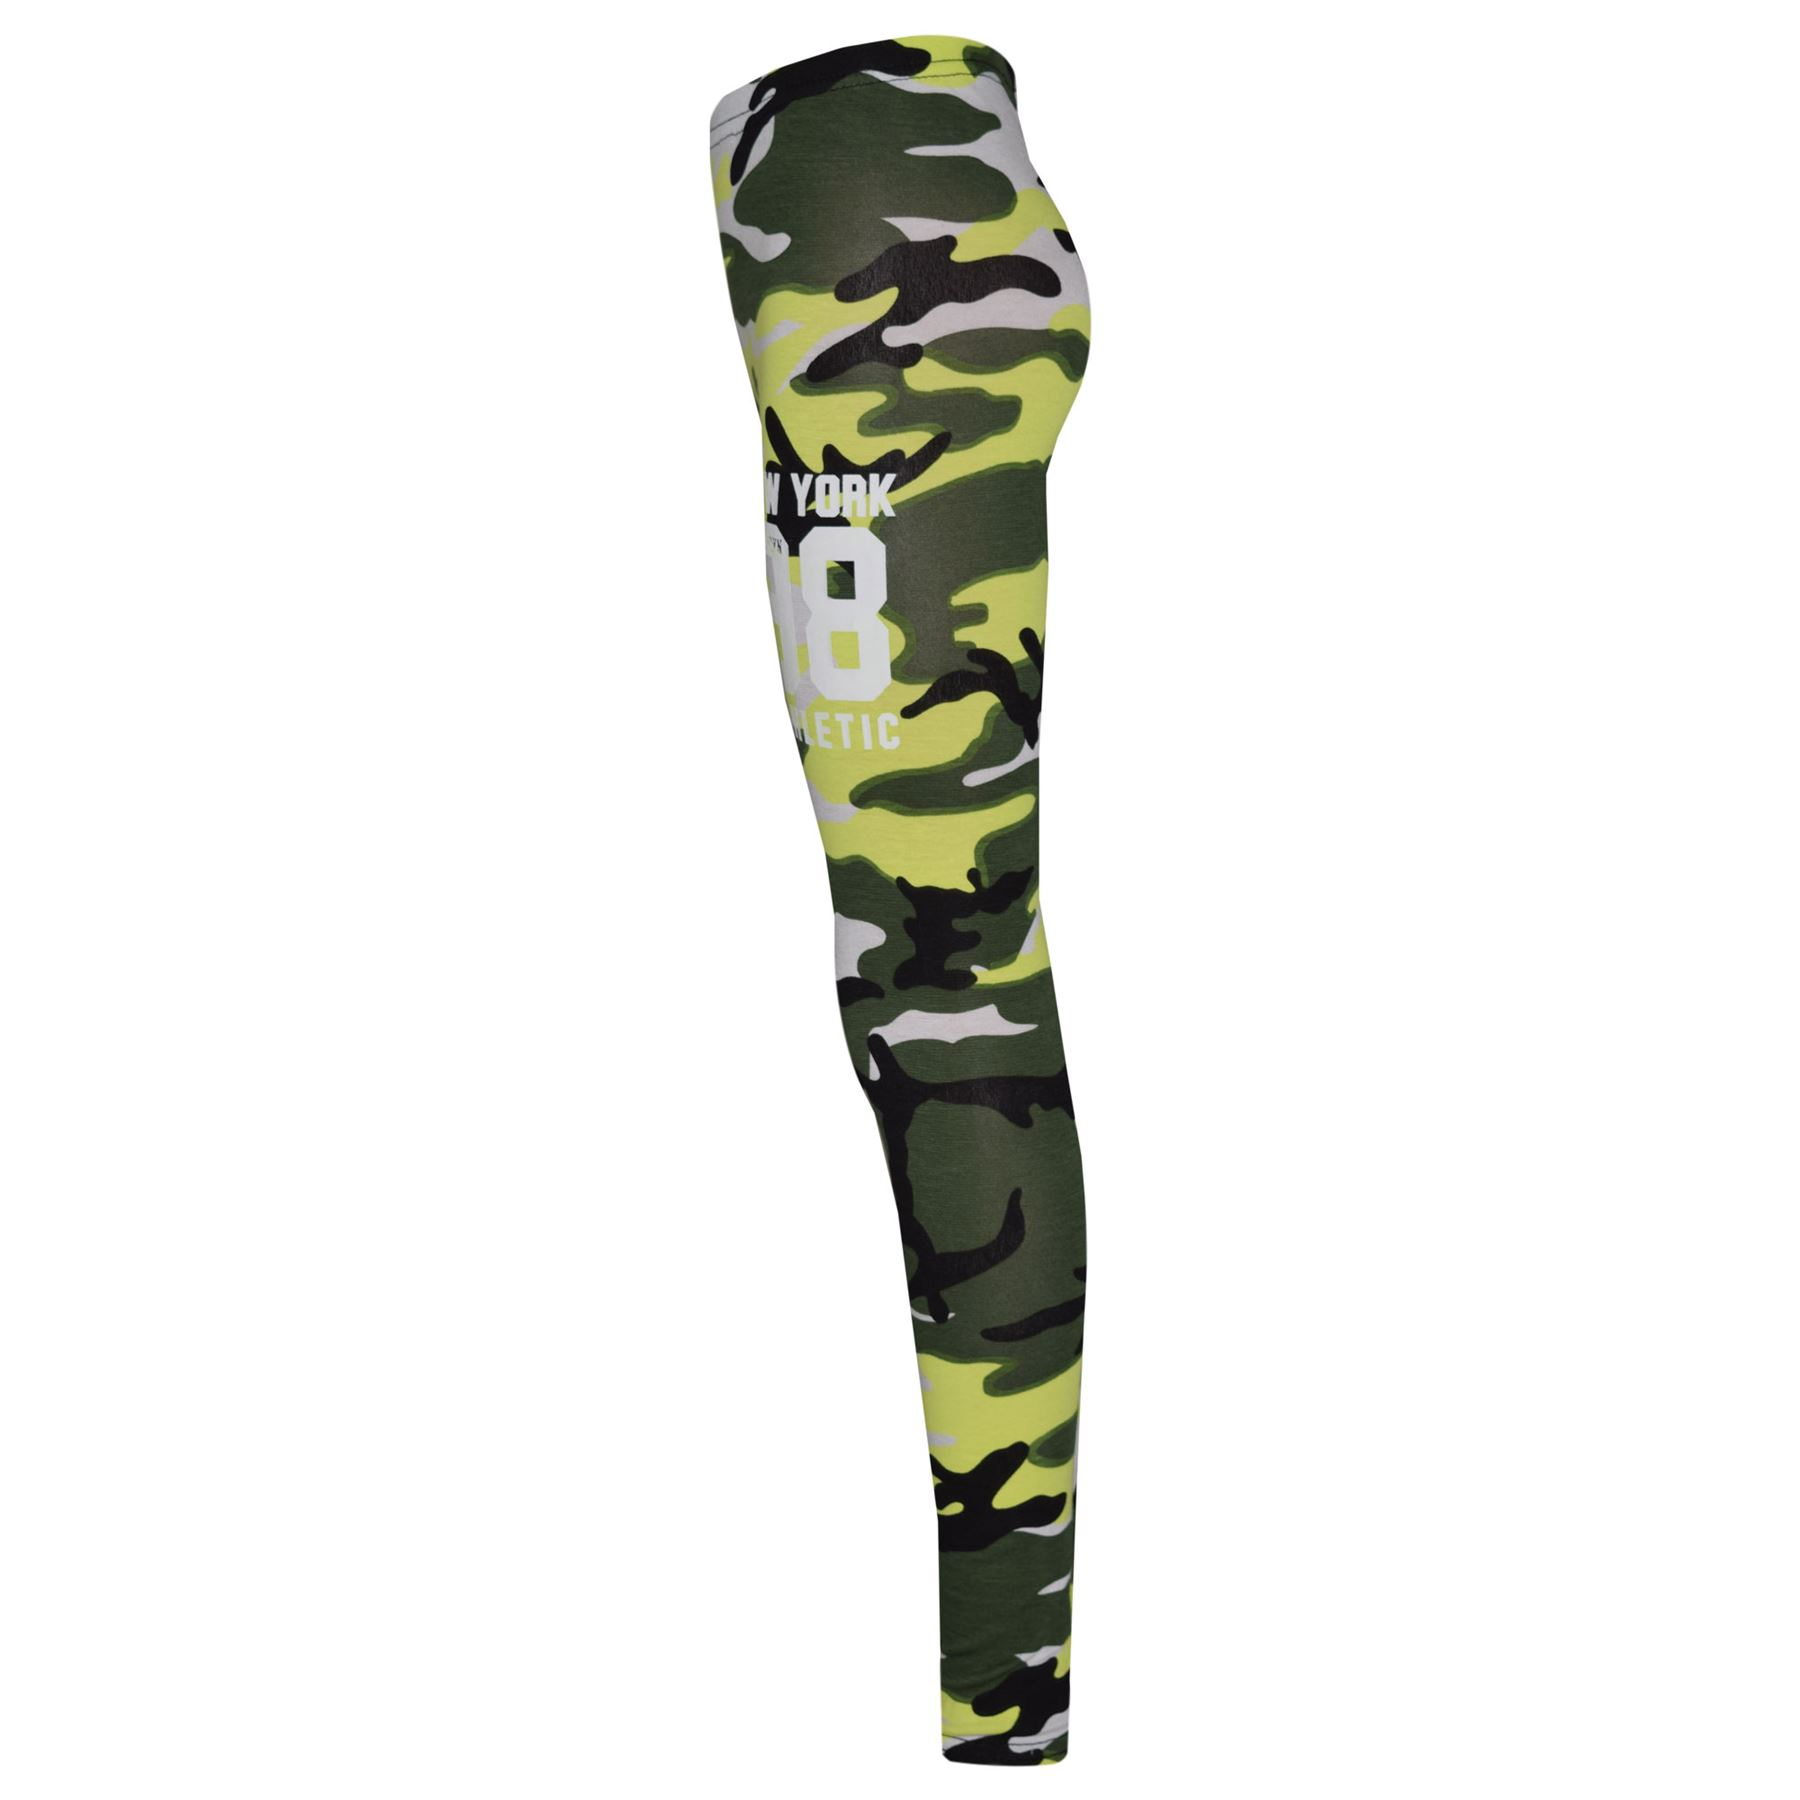 Girls-NEW-YORK-BROOKLYN-98-ATHLECTIC-Camouflage-Print-Top-amp-Legging-Set-7-13-Yr thumbnail 39